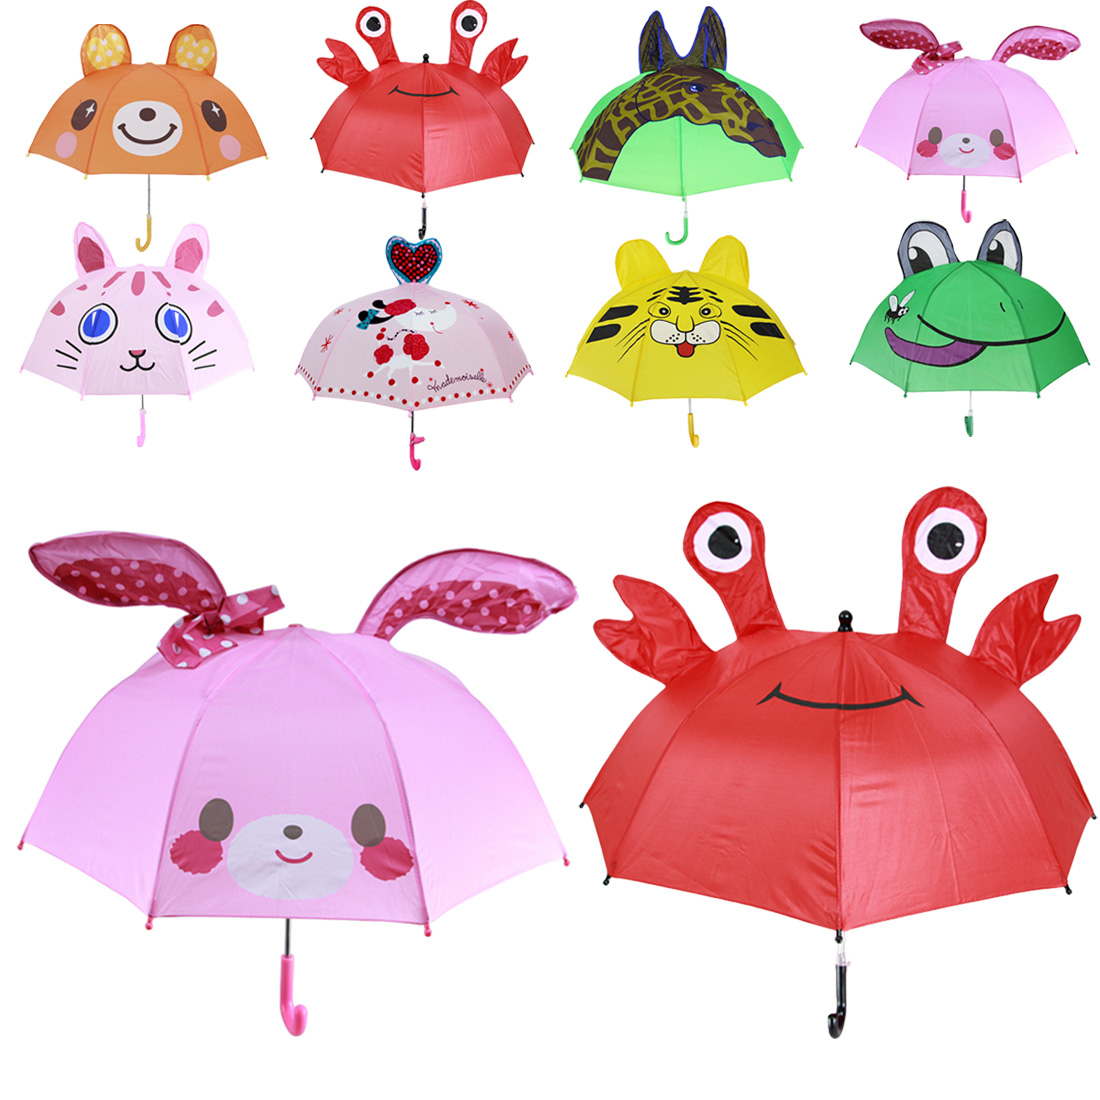 16e99651667b8 3D Animals Print Cute Umbrella for Boy Children Cartoon Long Handle Rain  Umbrella Girl Sun Protection